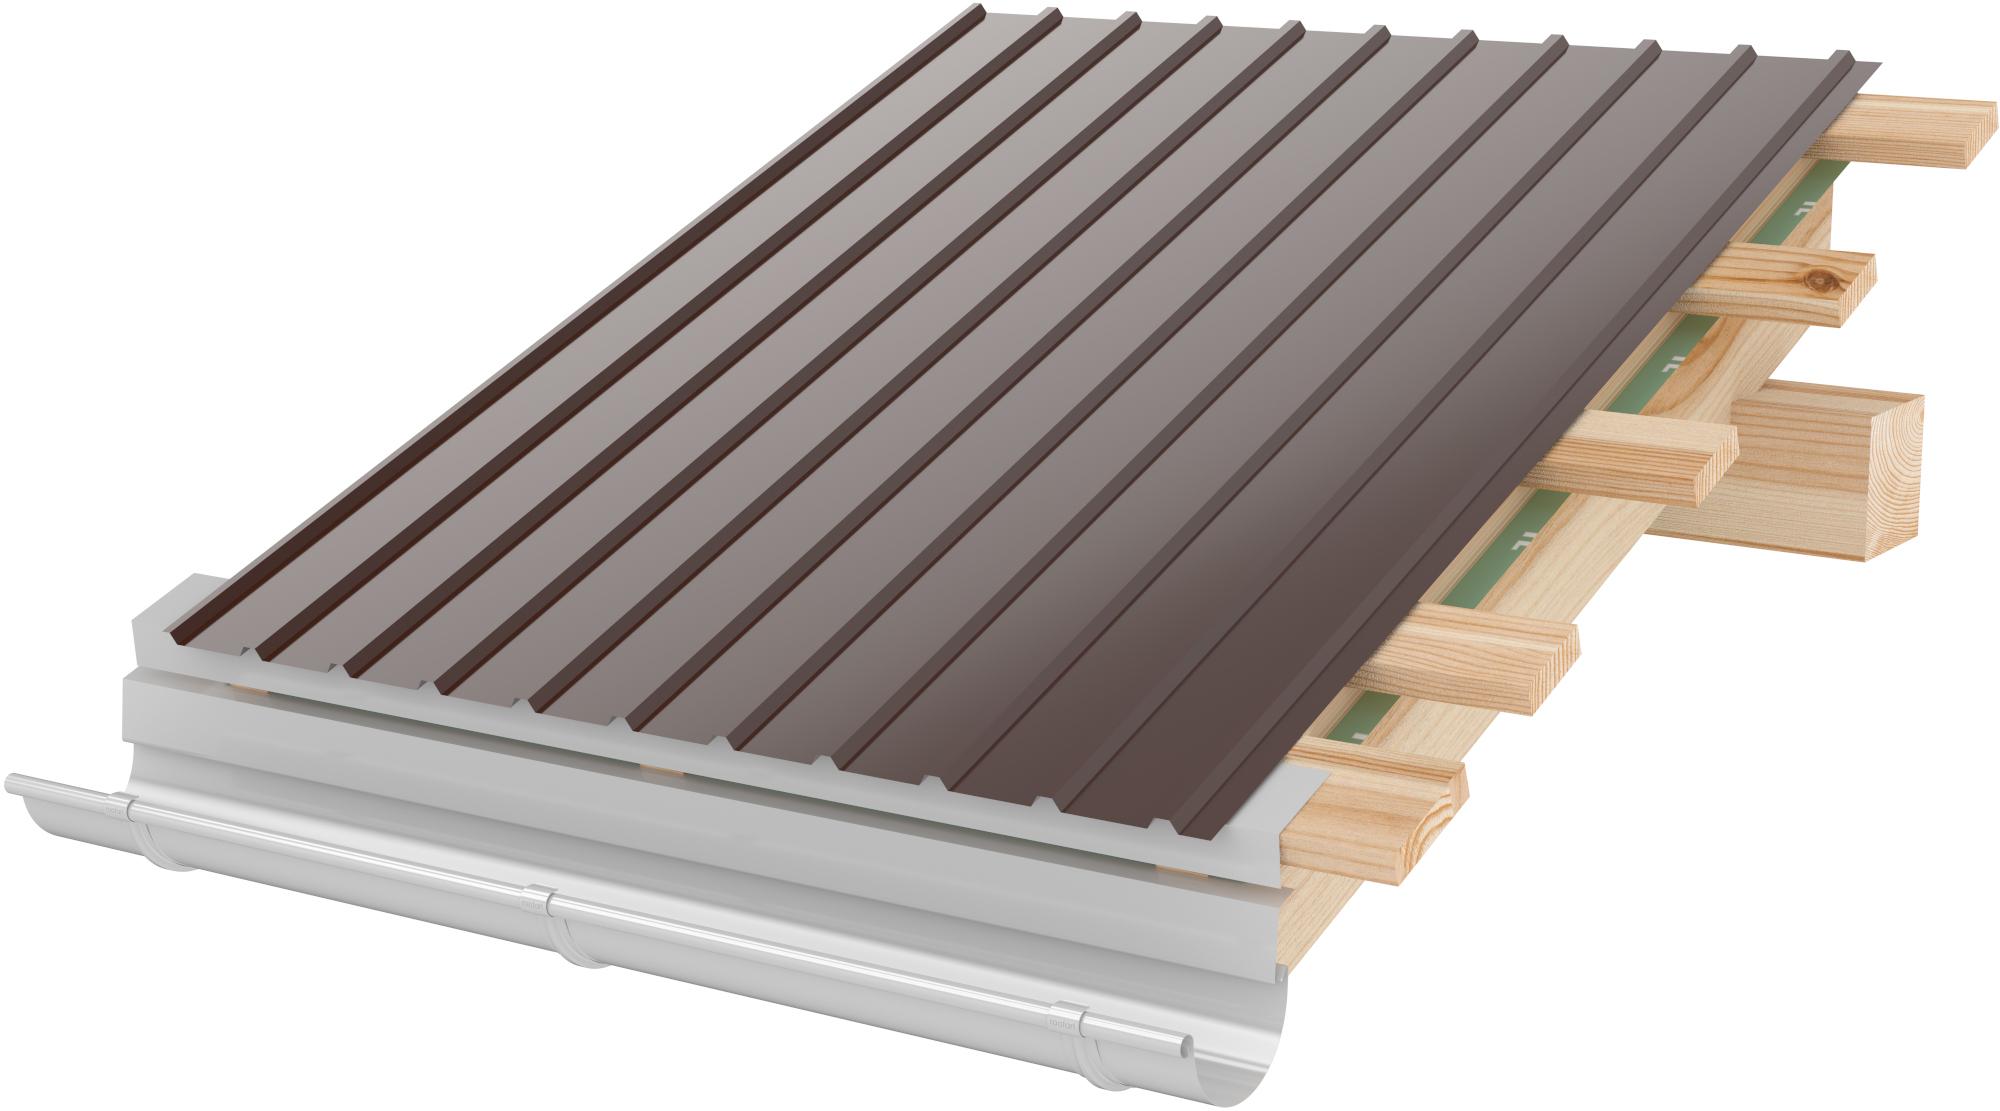 Tabla cutata RoofArt cuta 8mm